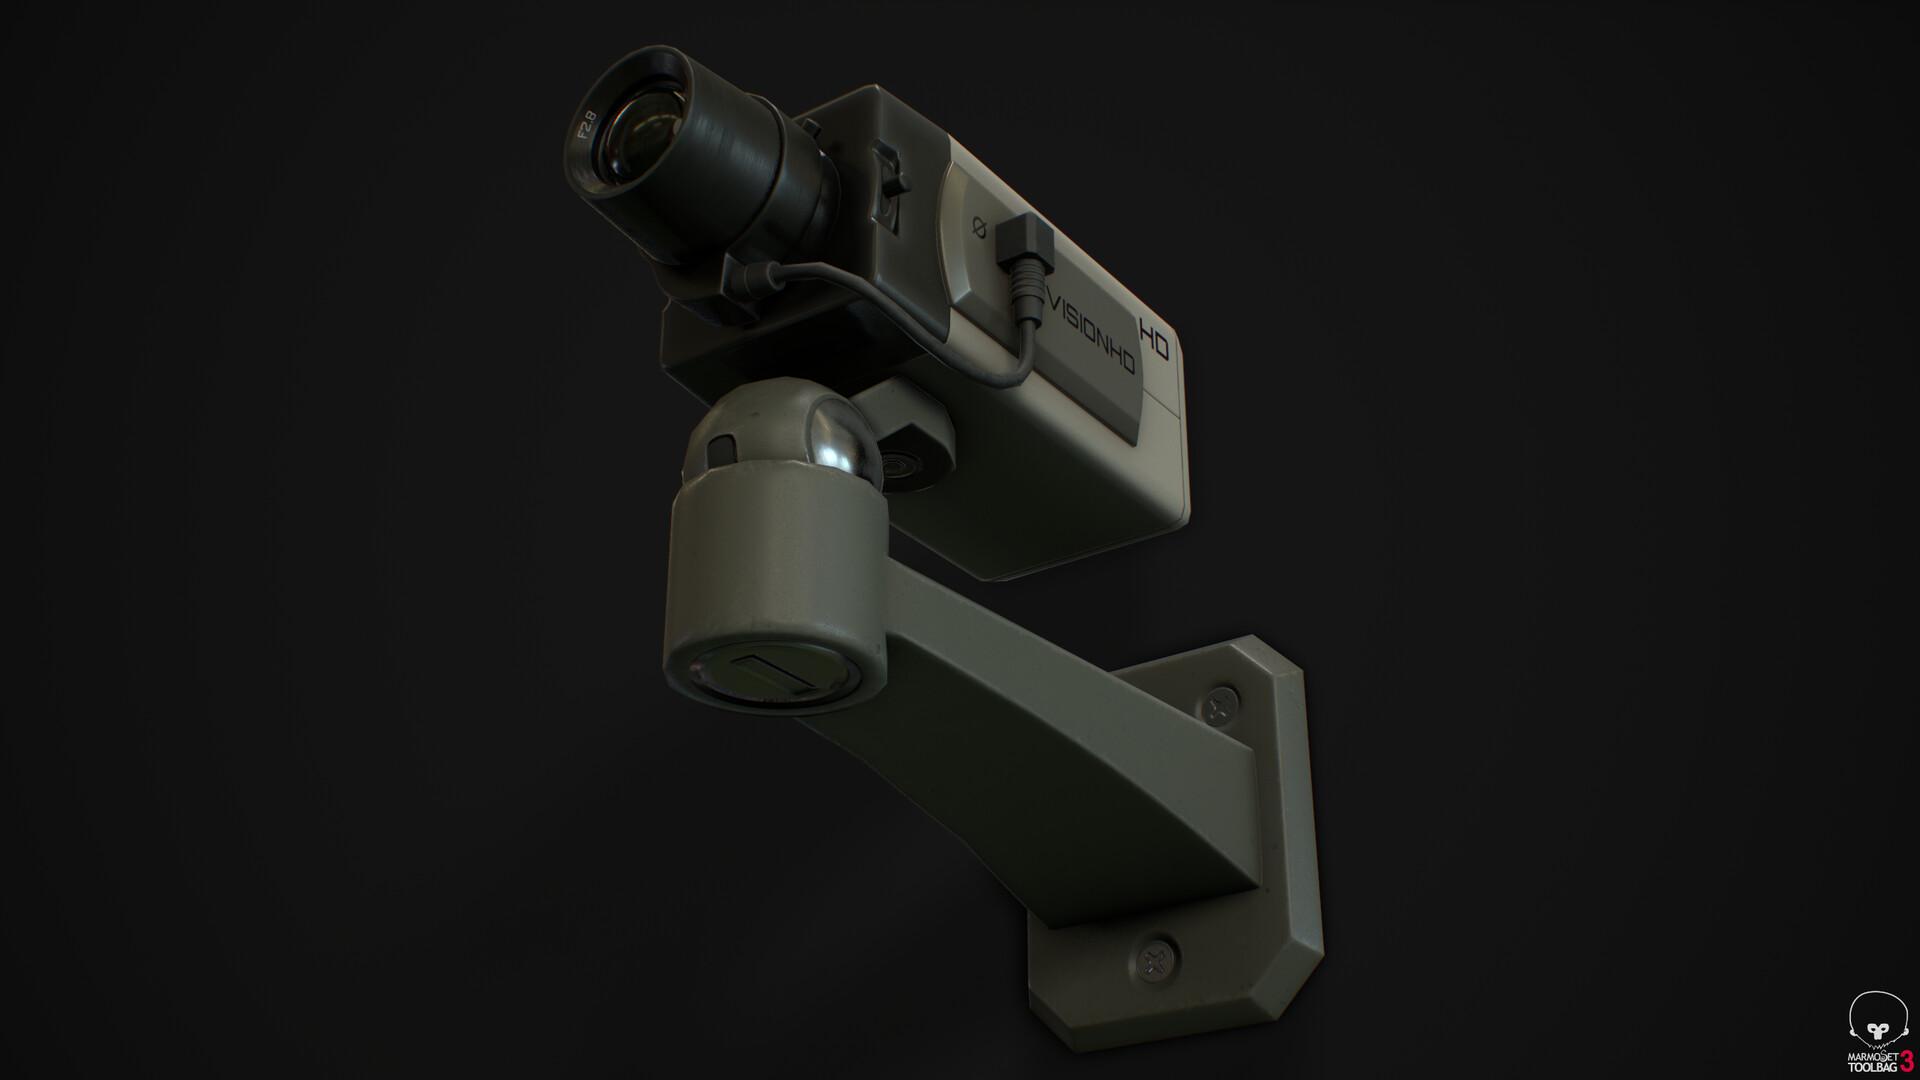 Camera A - Bottom